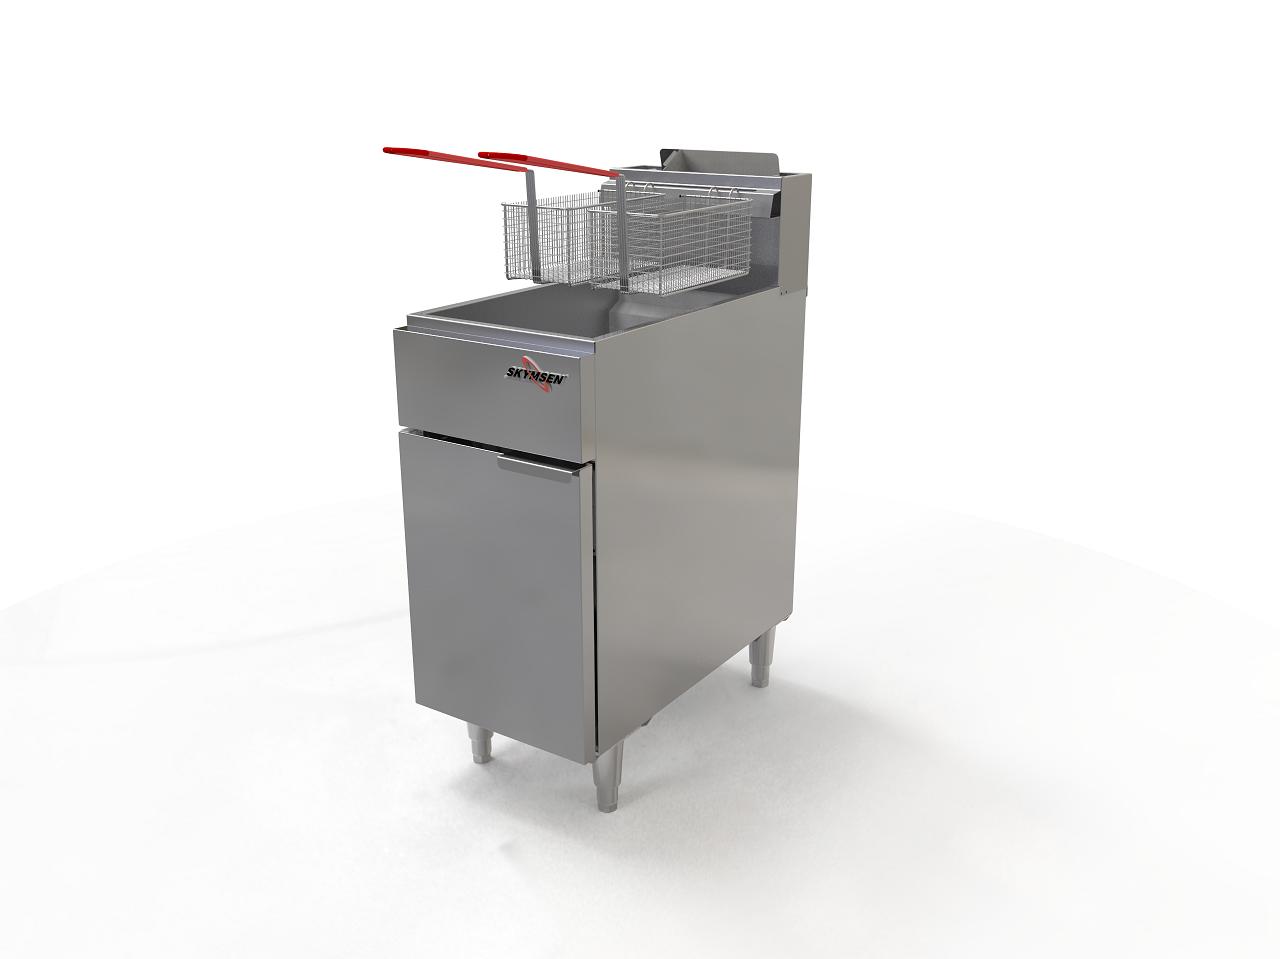 Fritadeira à gás FG20 Skymsen